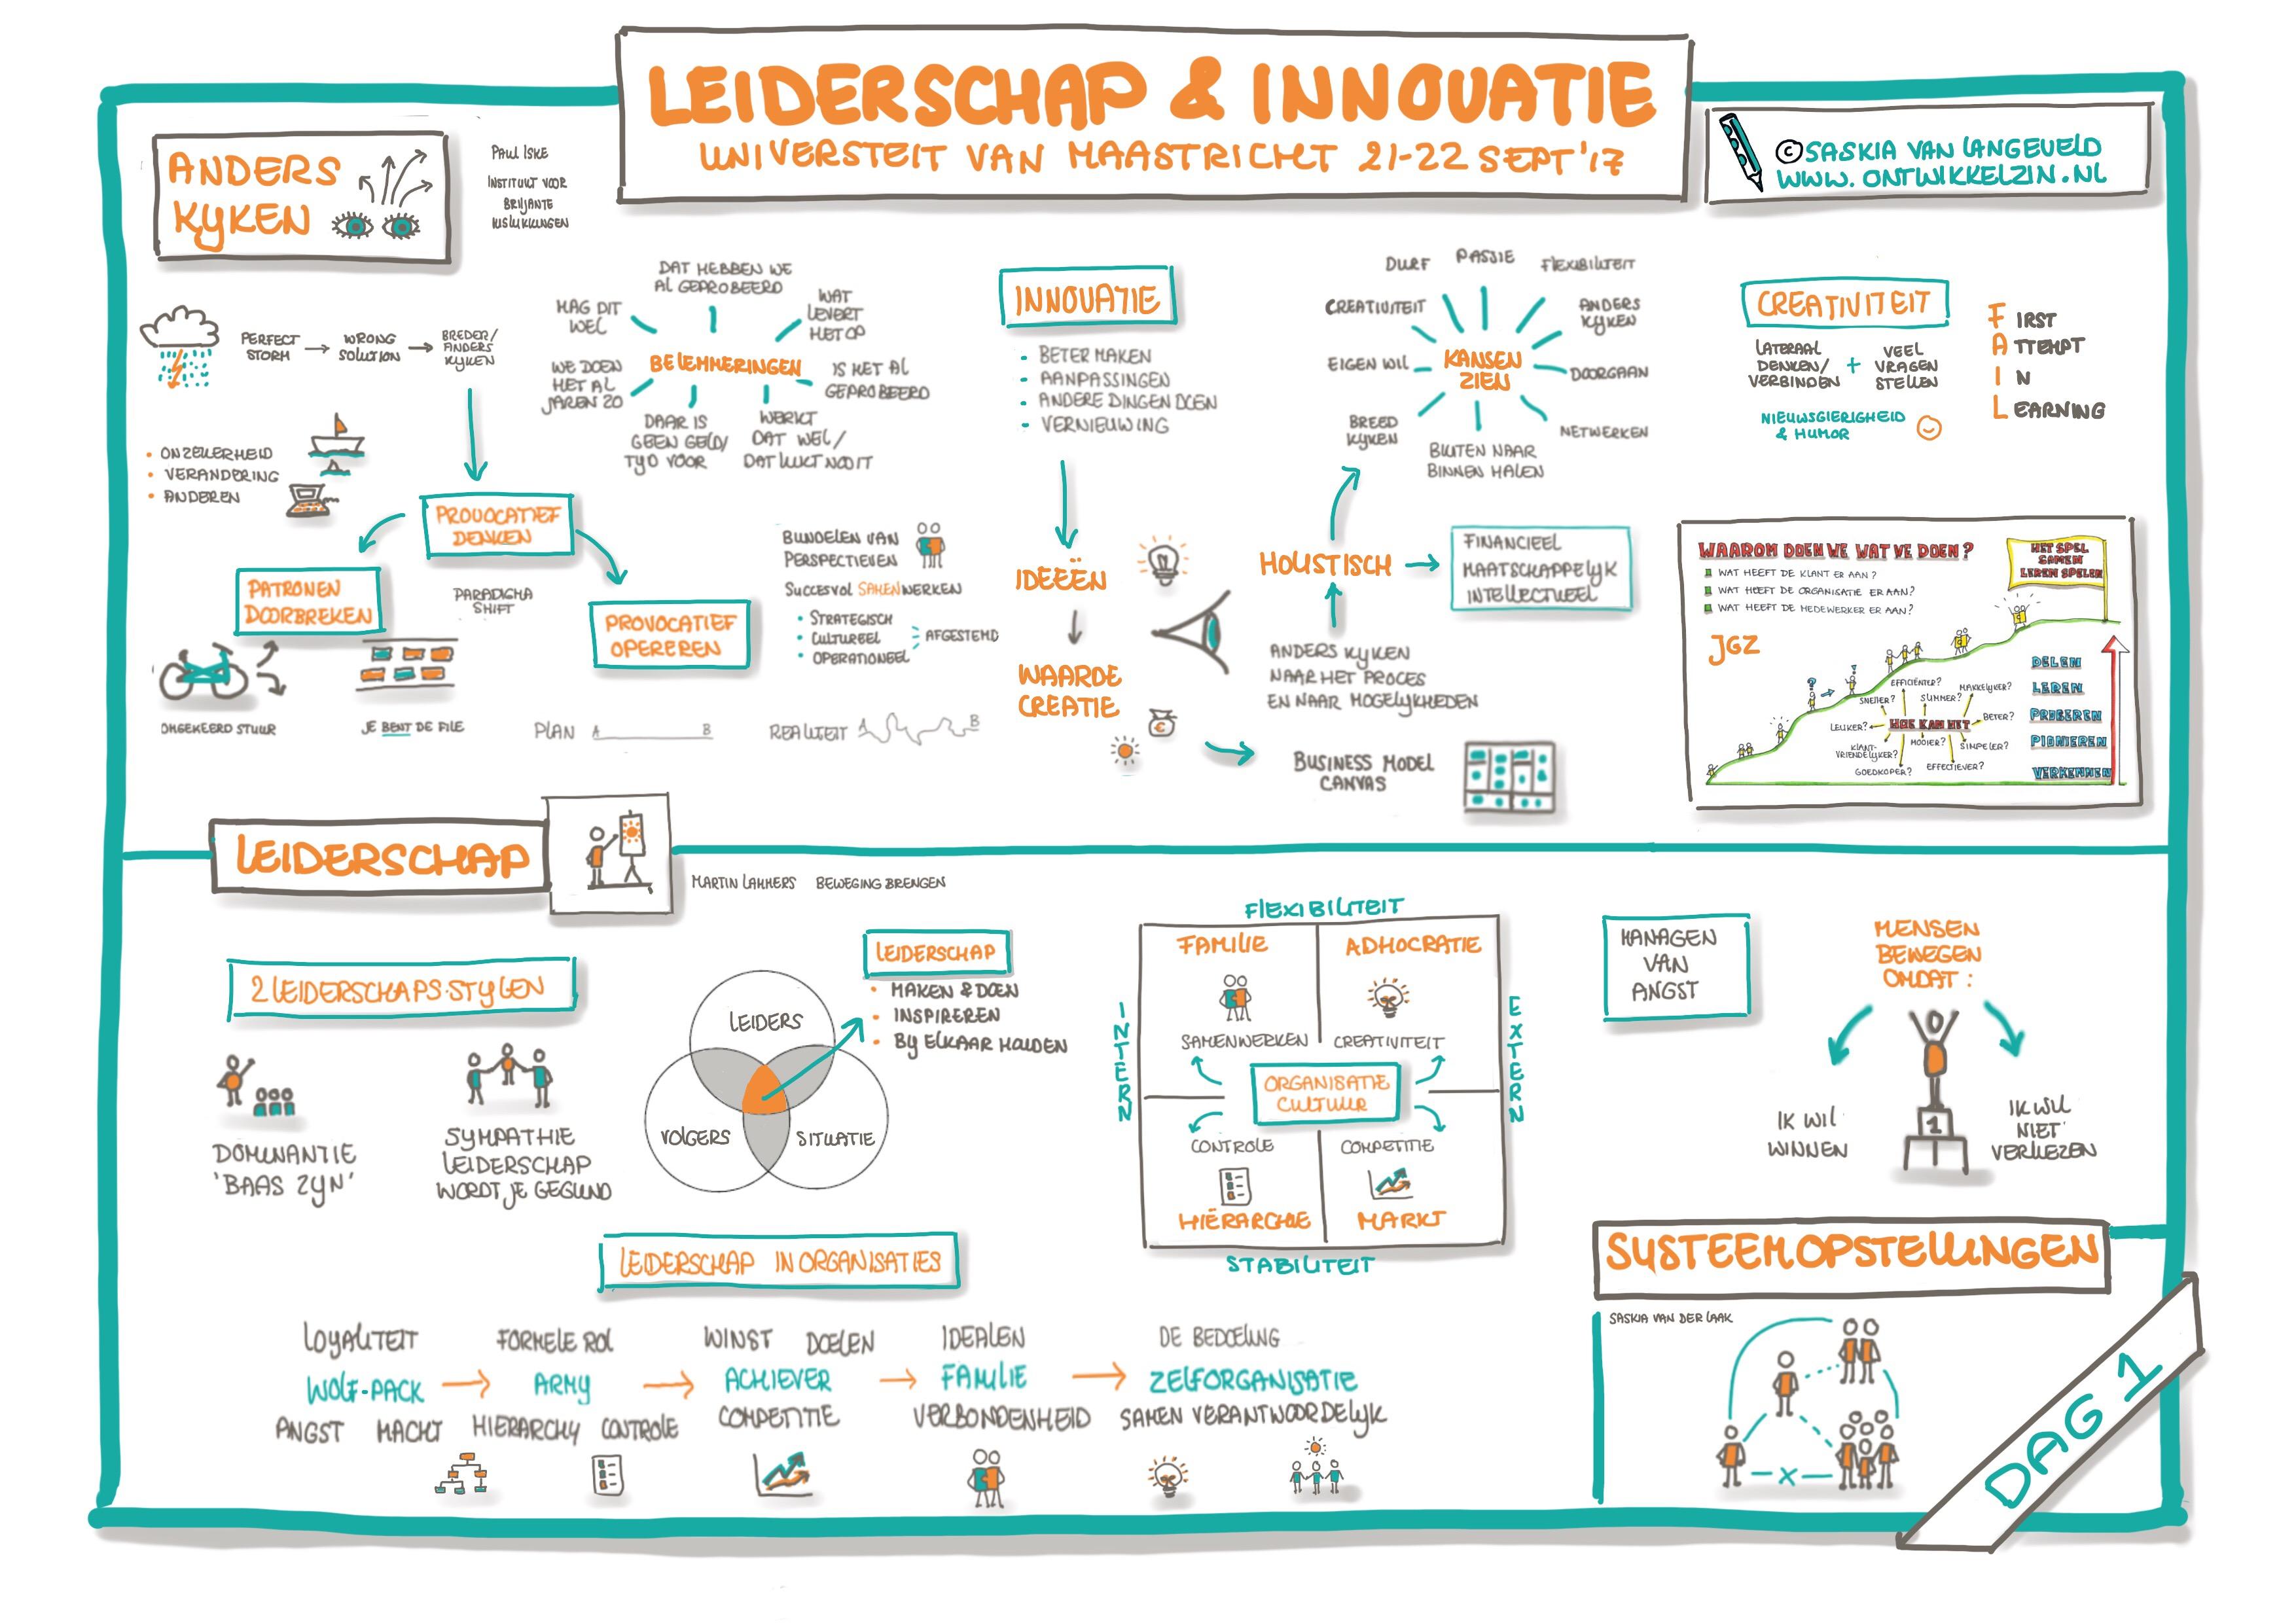 Visueel verslag Masterclass Leiderschap & Innovatie dag 1